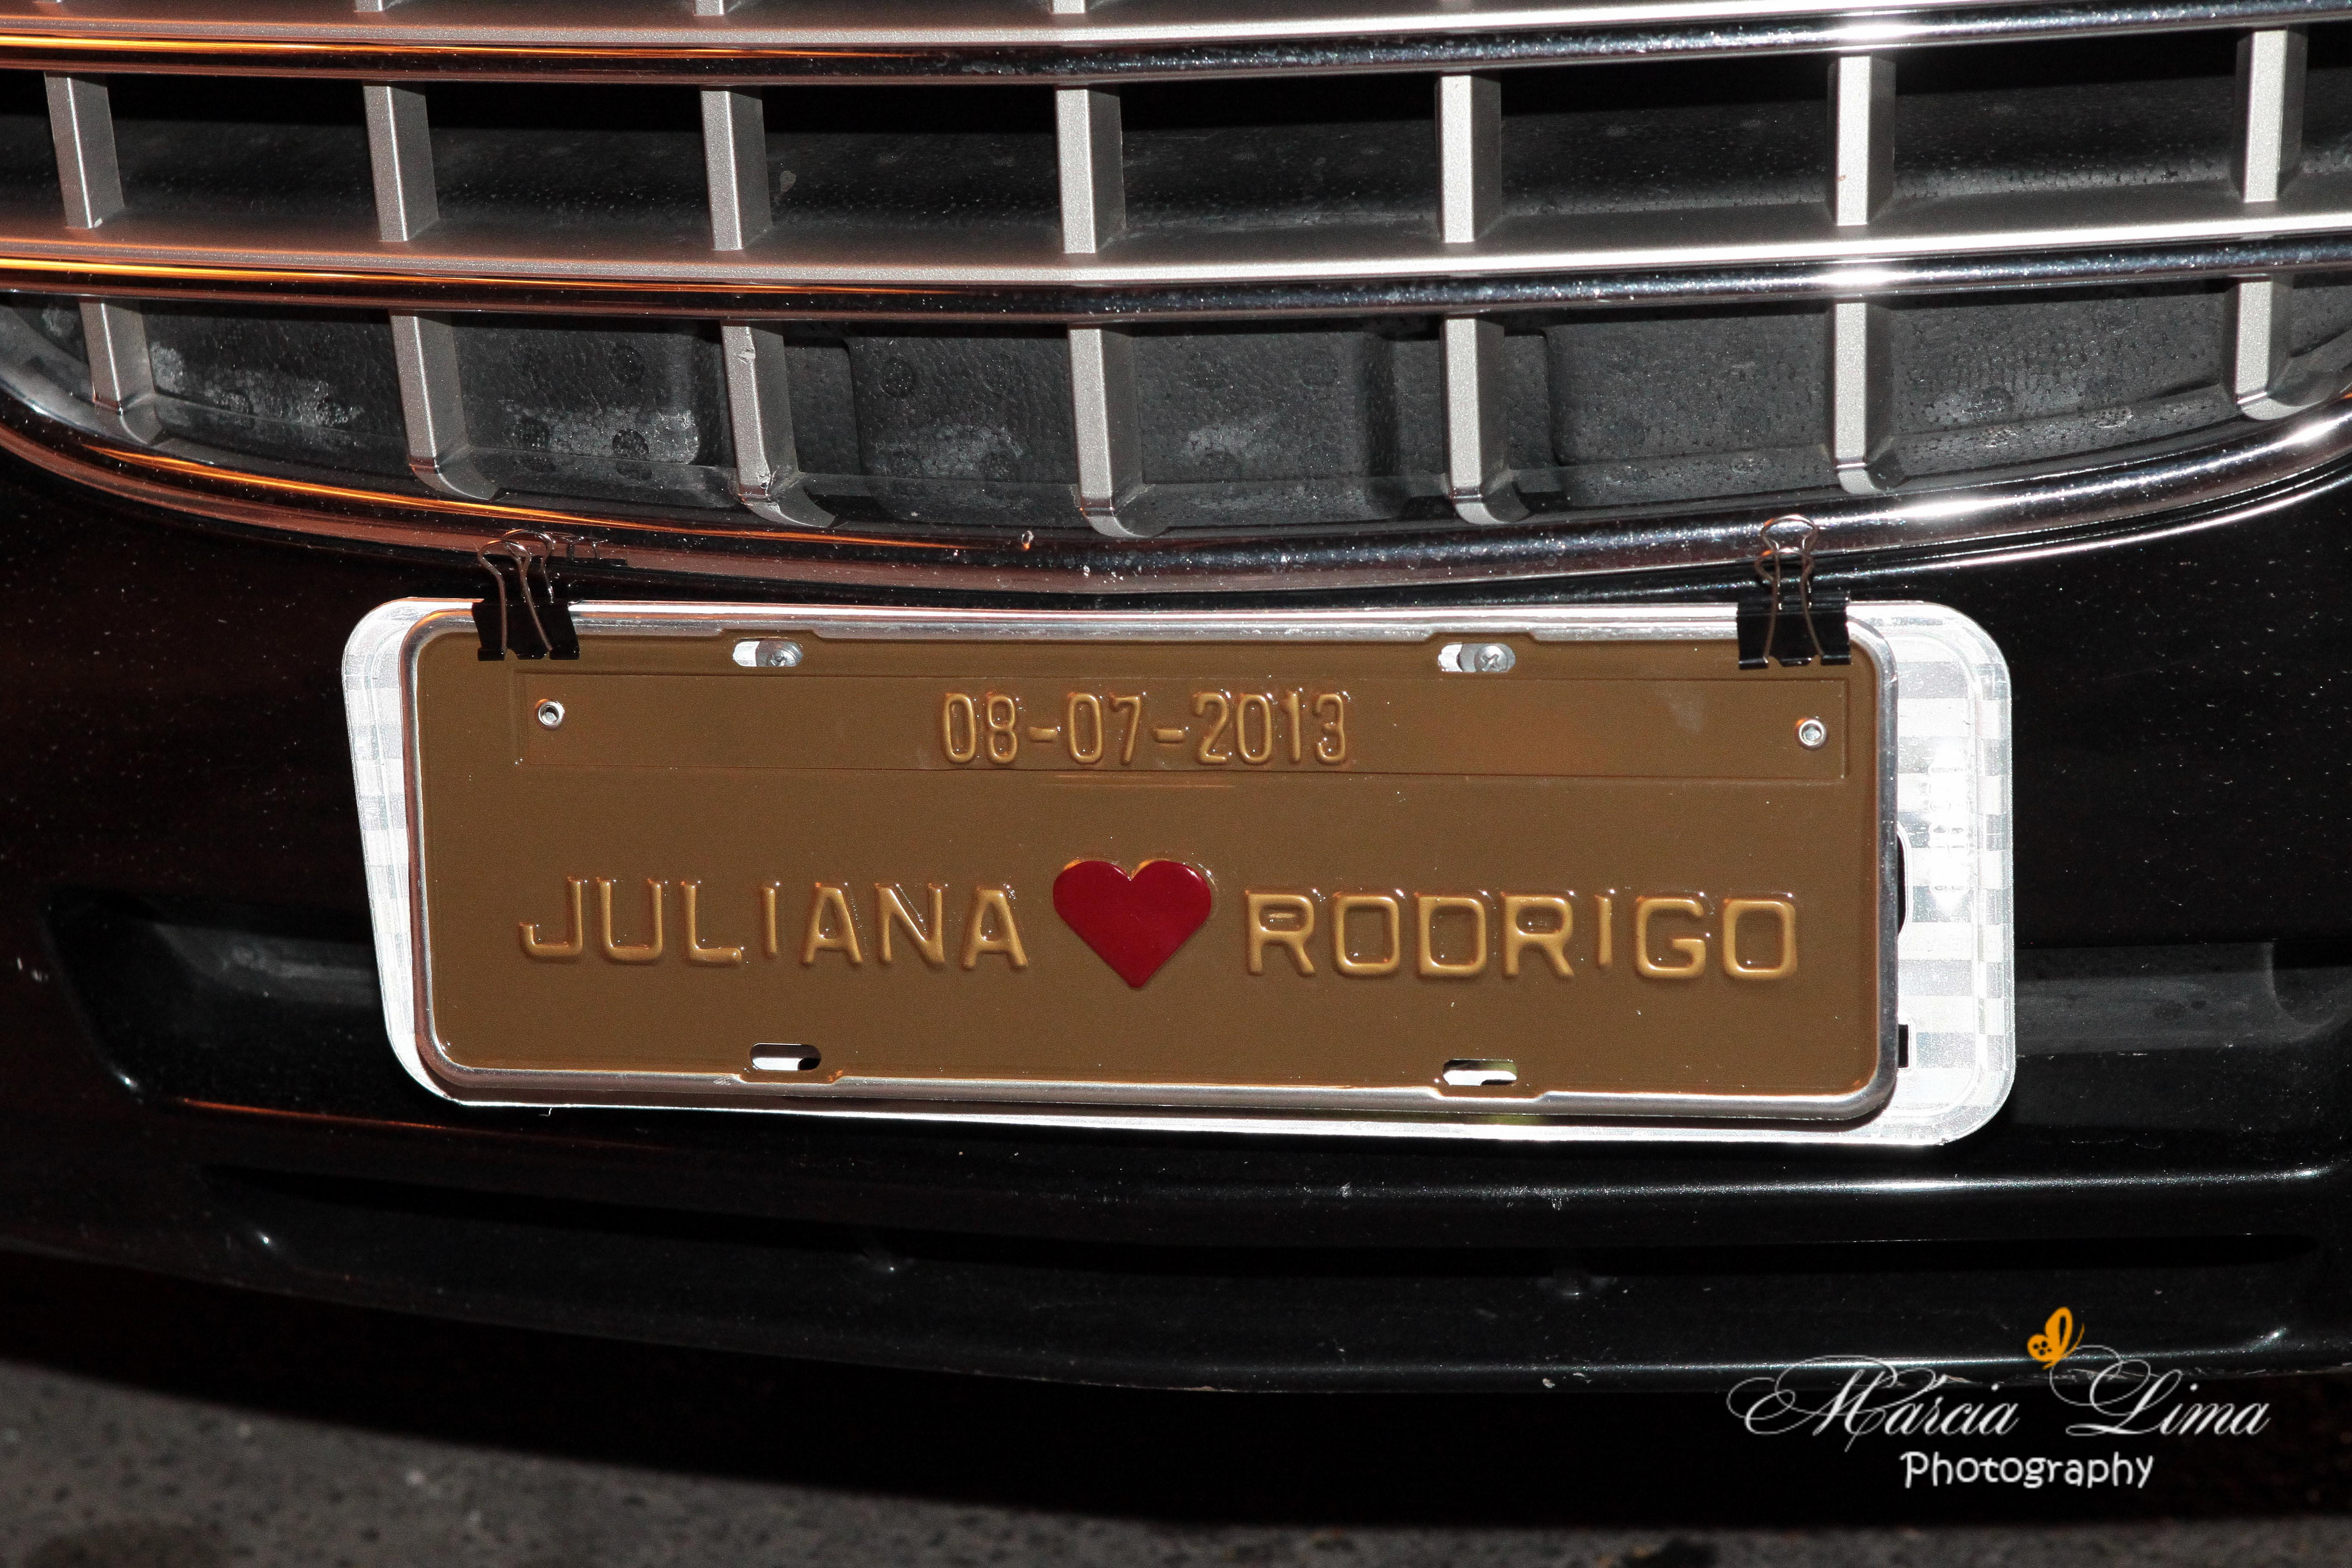 286 - Ju  &  Rodrigo